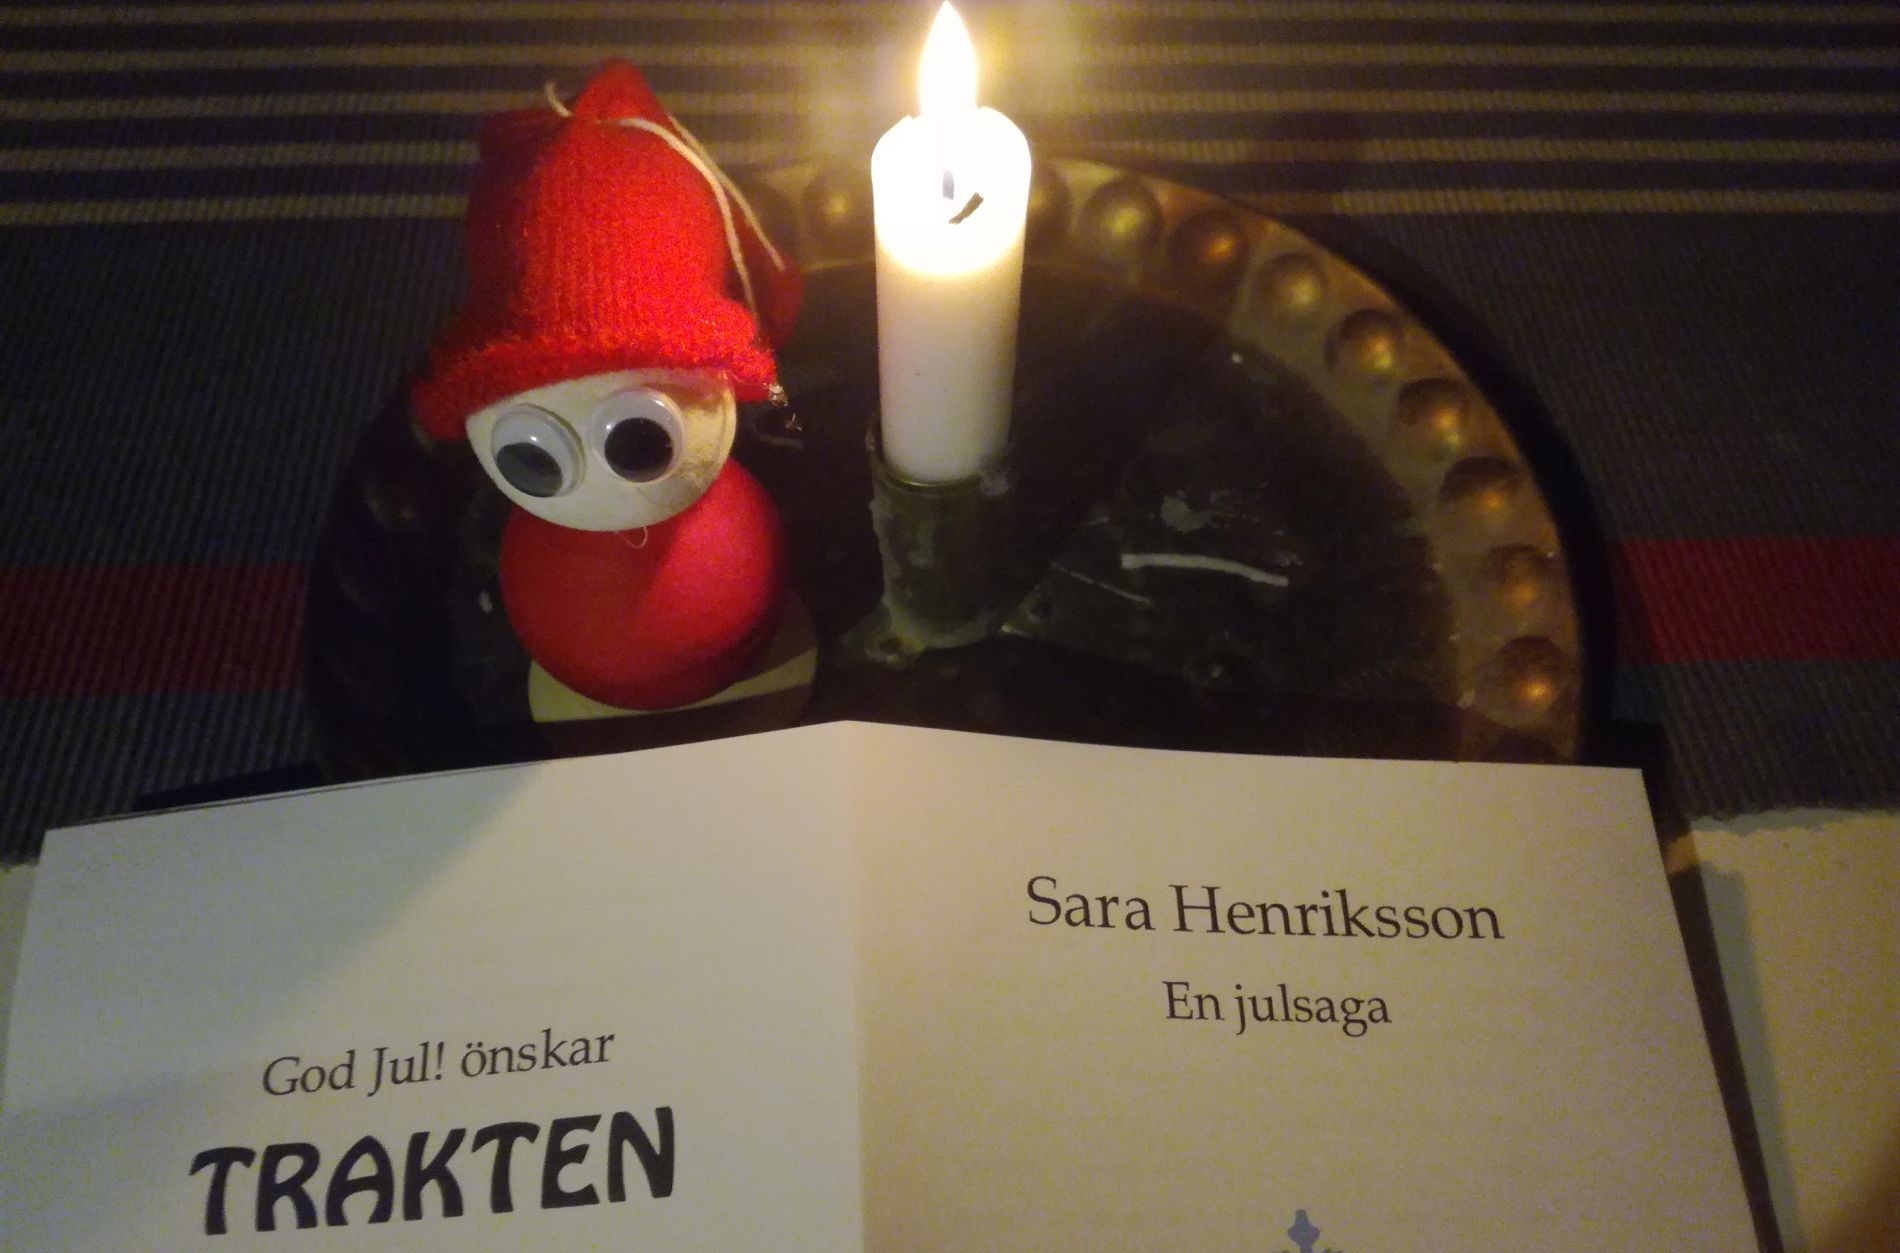 Trakten Julsaga Sara Henriksson